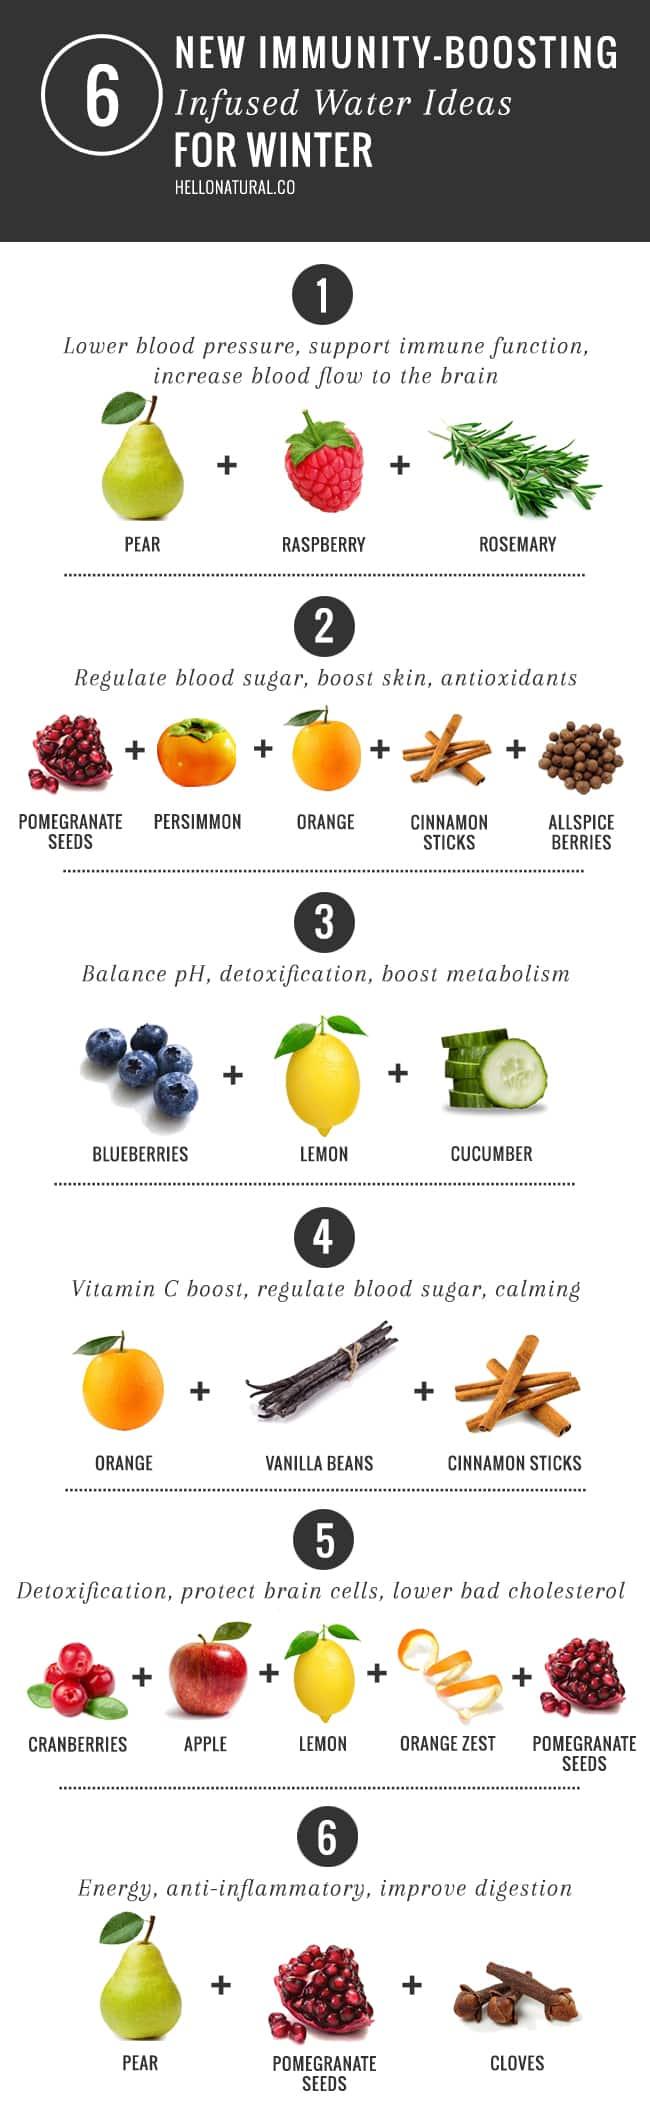 5-immunity-boosting-infused-water-ideas